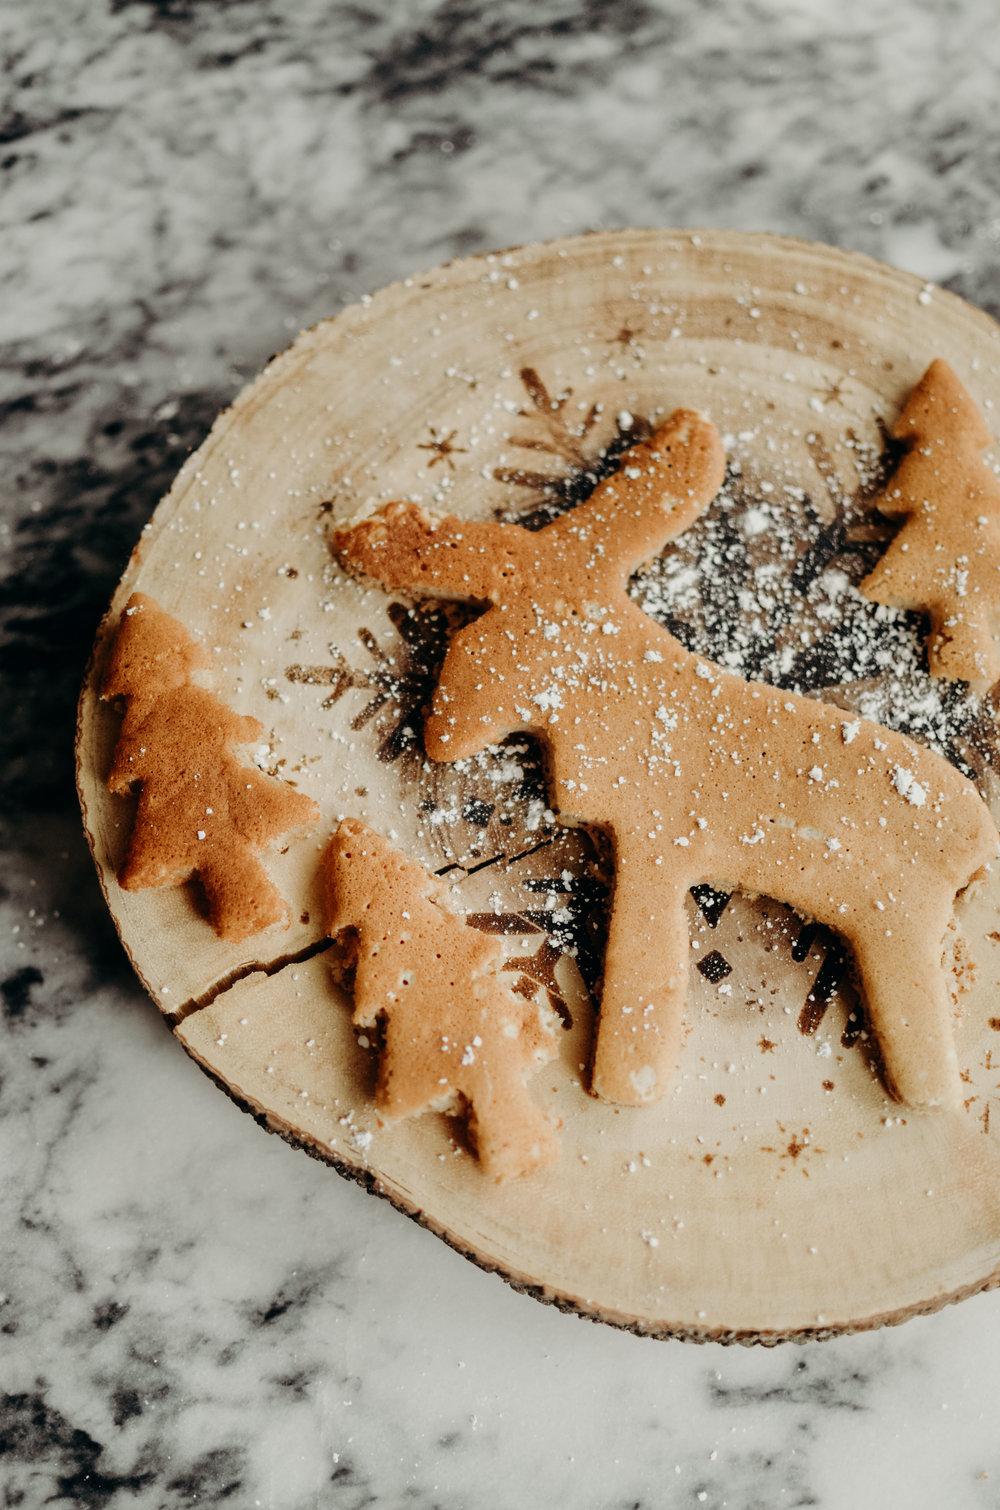 Wendling_Boyd_Moose_Shaped_Buffalo_Butter_Pancakes_Recipe-16.jpg